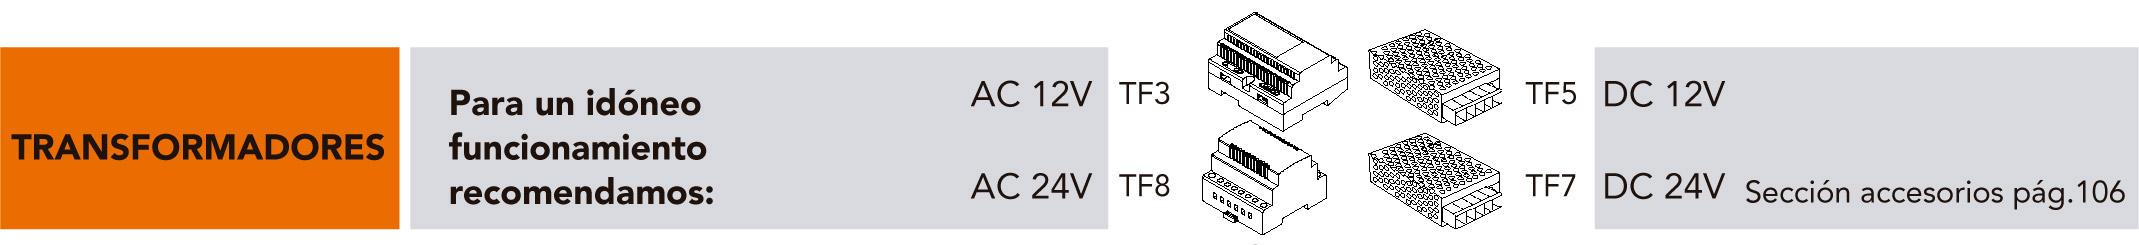 S48_transformadores